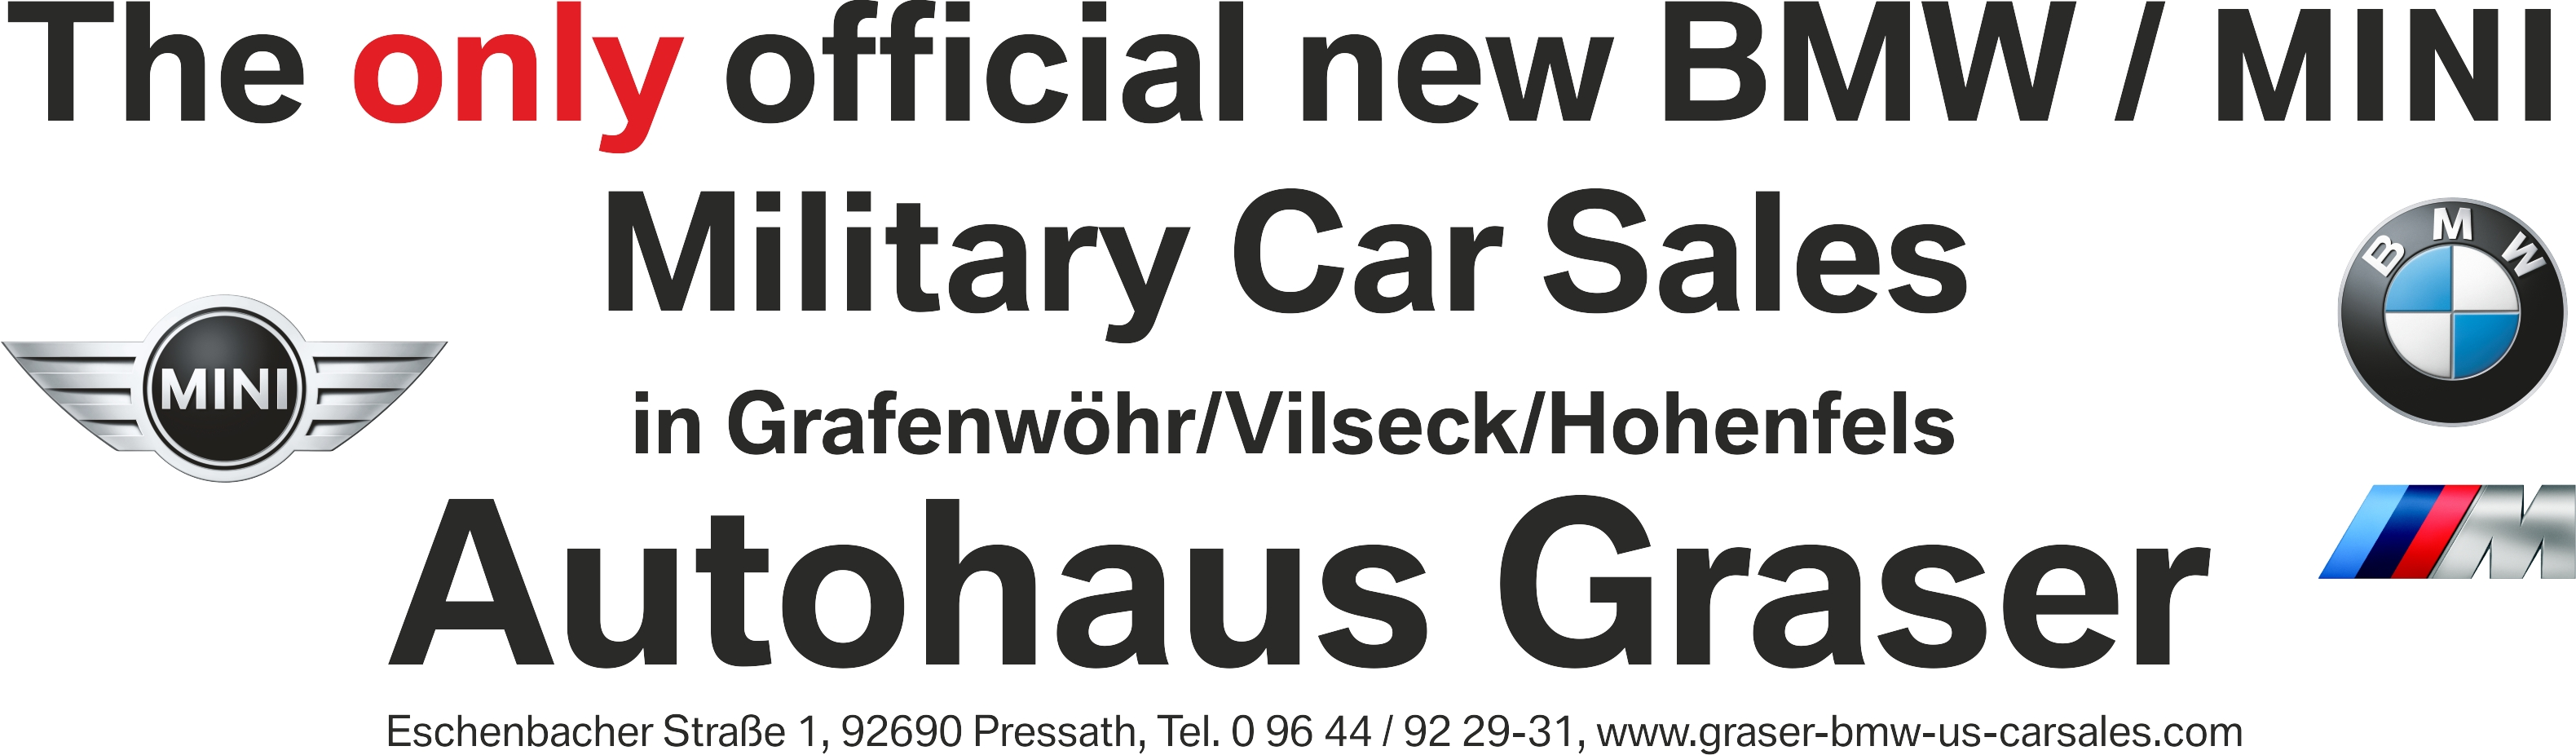 Autohaus_Graser_Logo.jpg